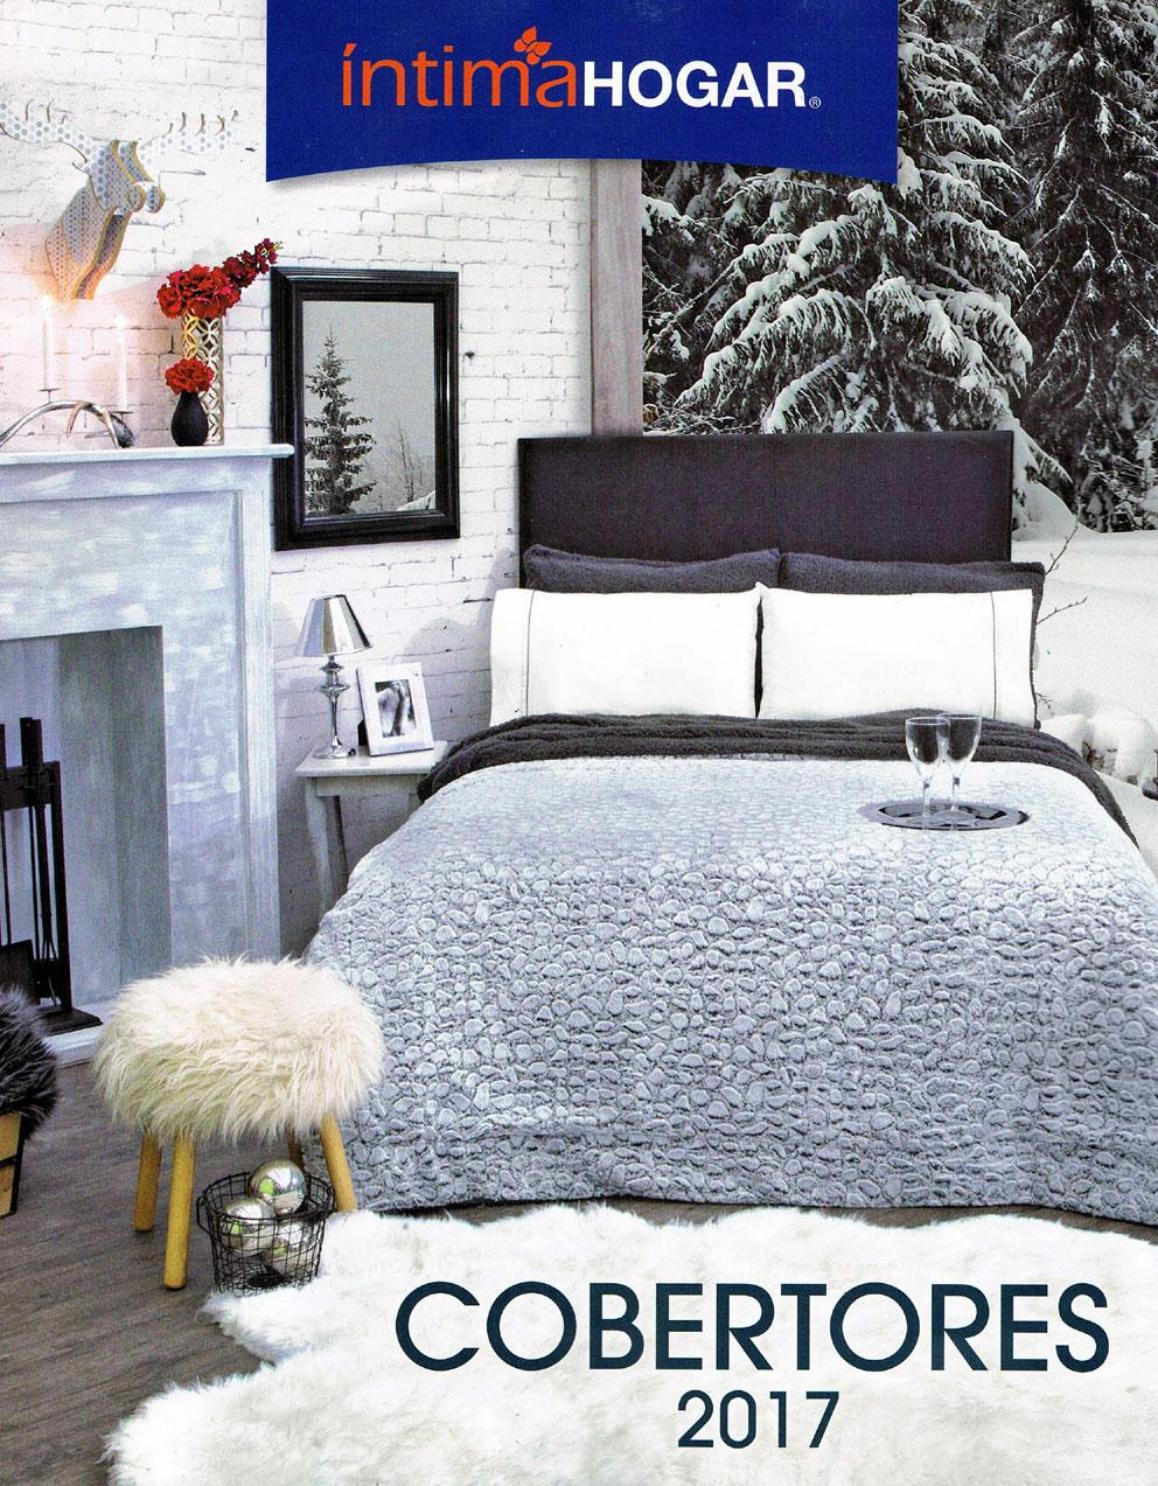 Catalogo intima cobertores 2016 2017 by catalogos por for Nicoloro arredamenti catalogo 2017